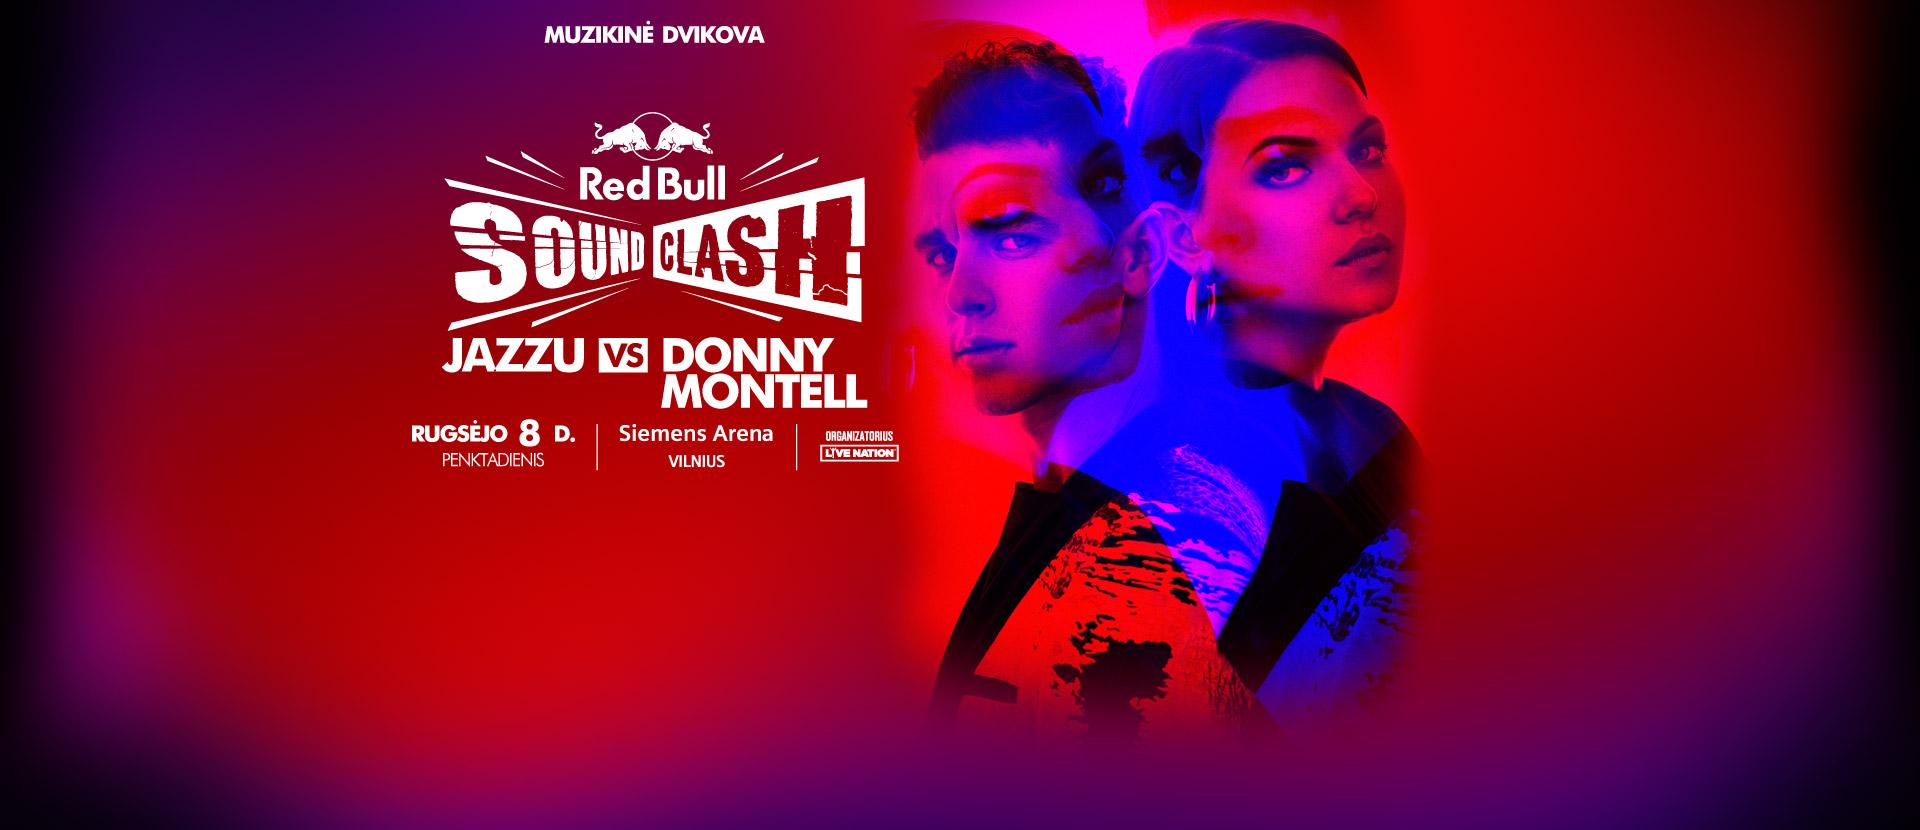 RED BULL SOUND CLASH: JAZZU vs DONNY MONTEL